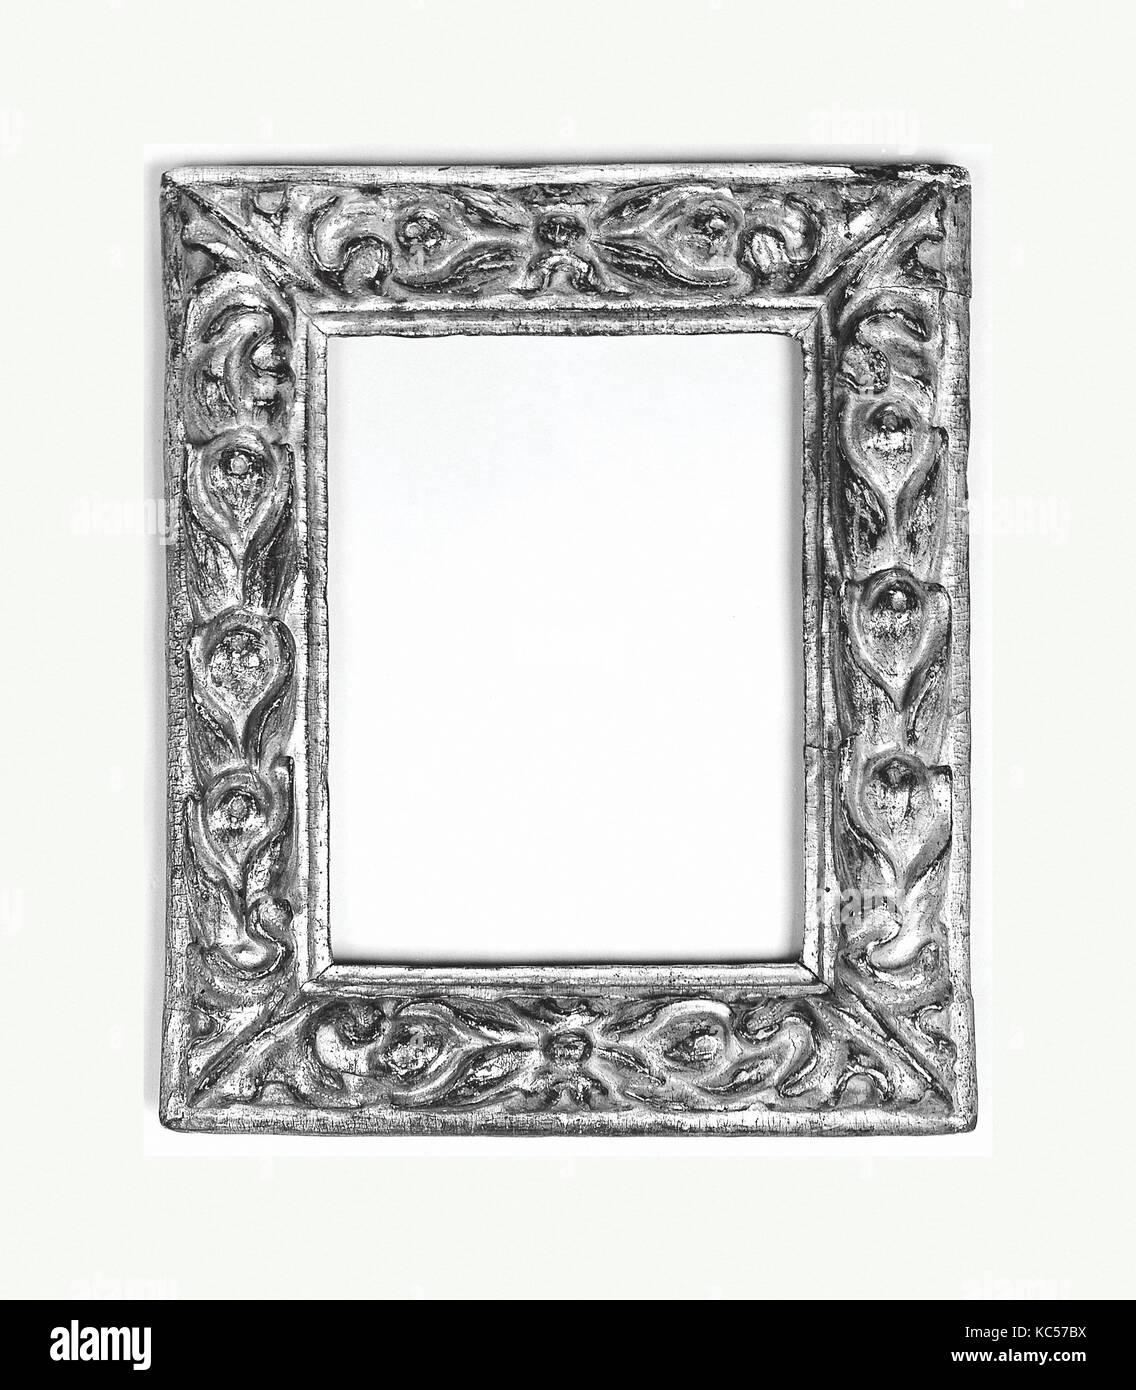 Schlagleisten frame, Ende 16. bis Anfang des 17. Jahrhunderts ...